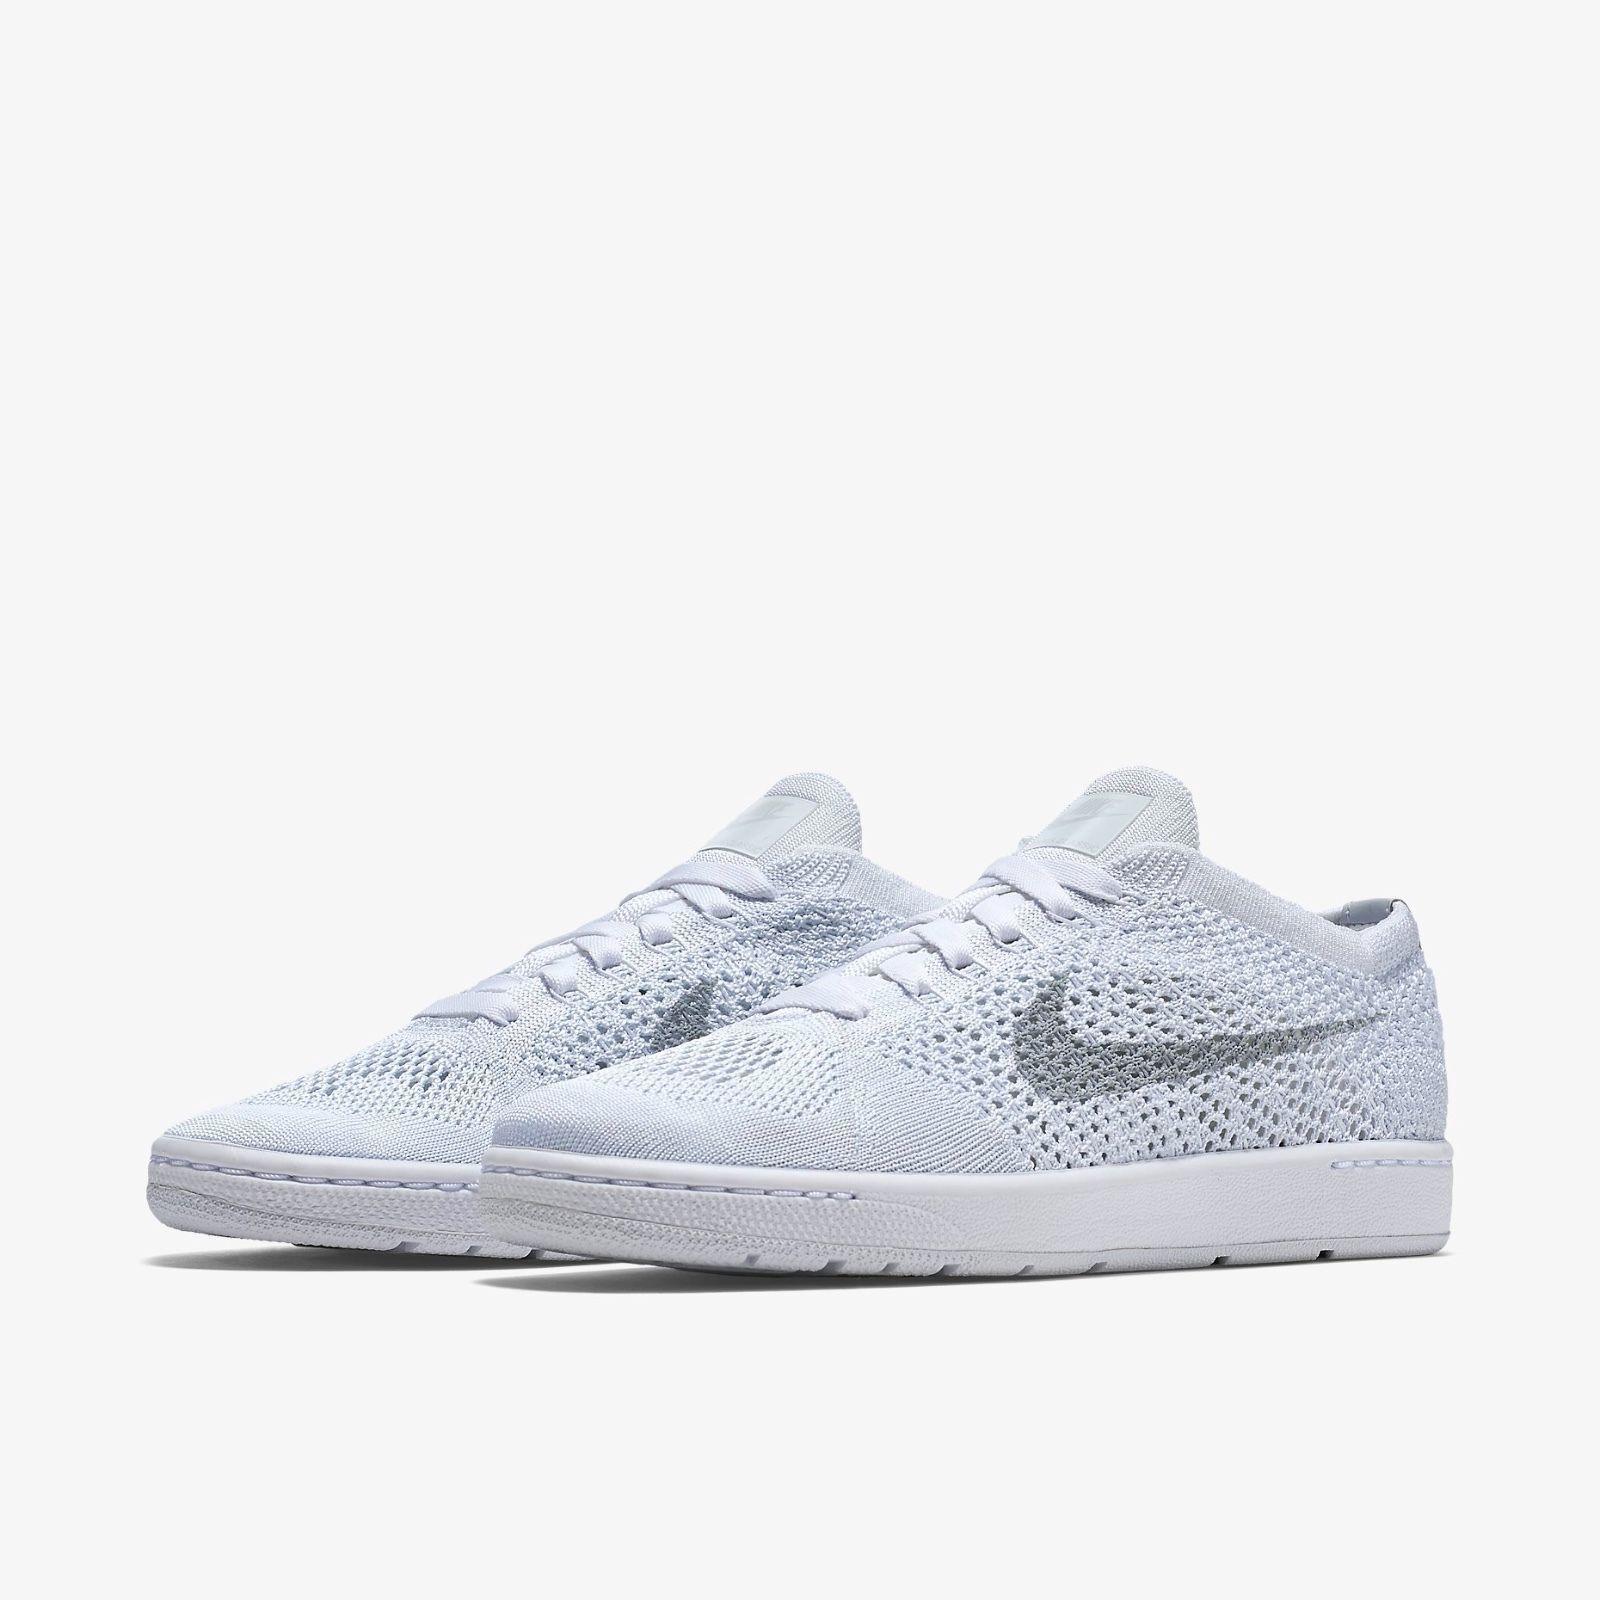 cheap for discount a240c 78089 ... france nuove nike tennis classico ultra flyknit scarpe femminili sz sz  femminili 12 bianco 833860 101